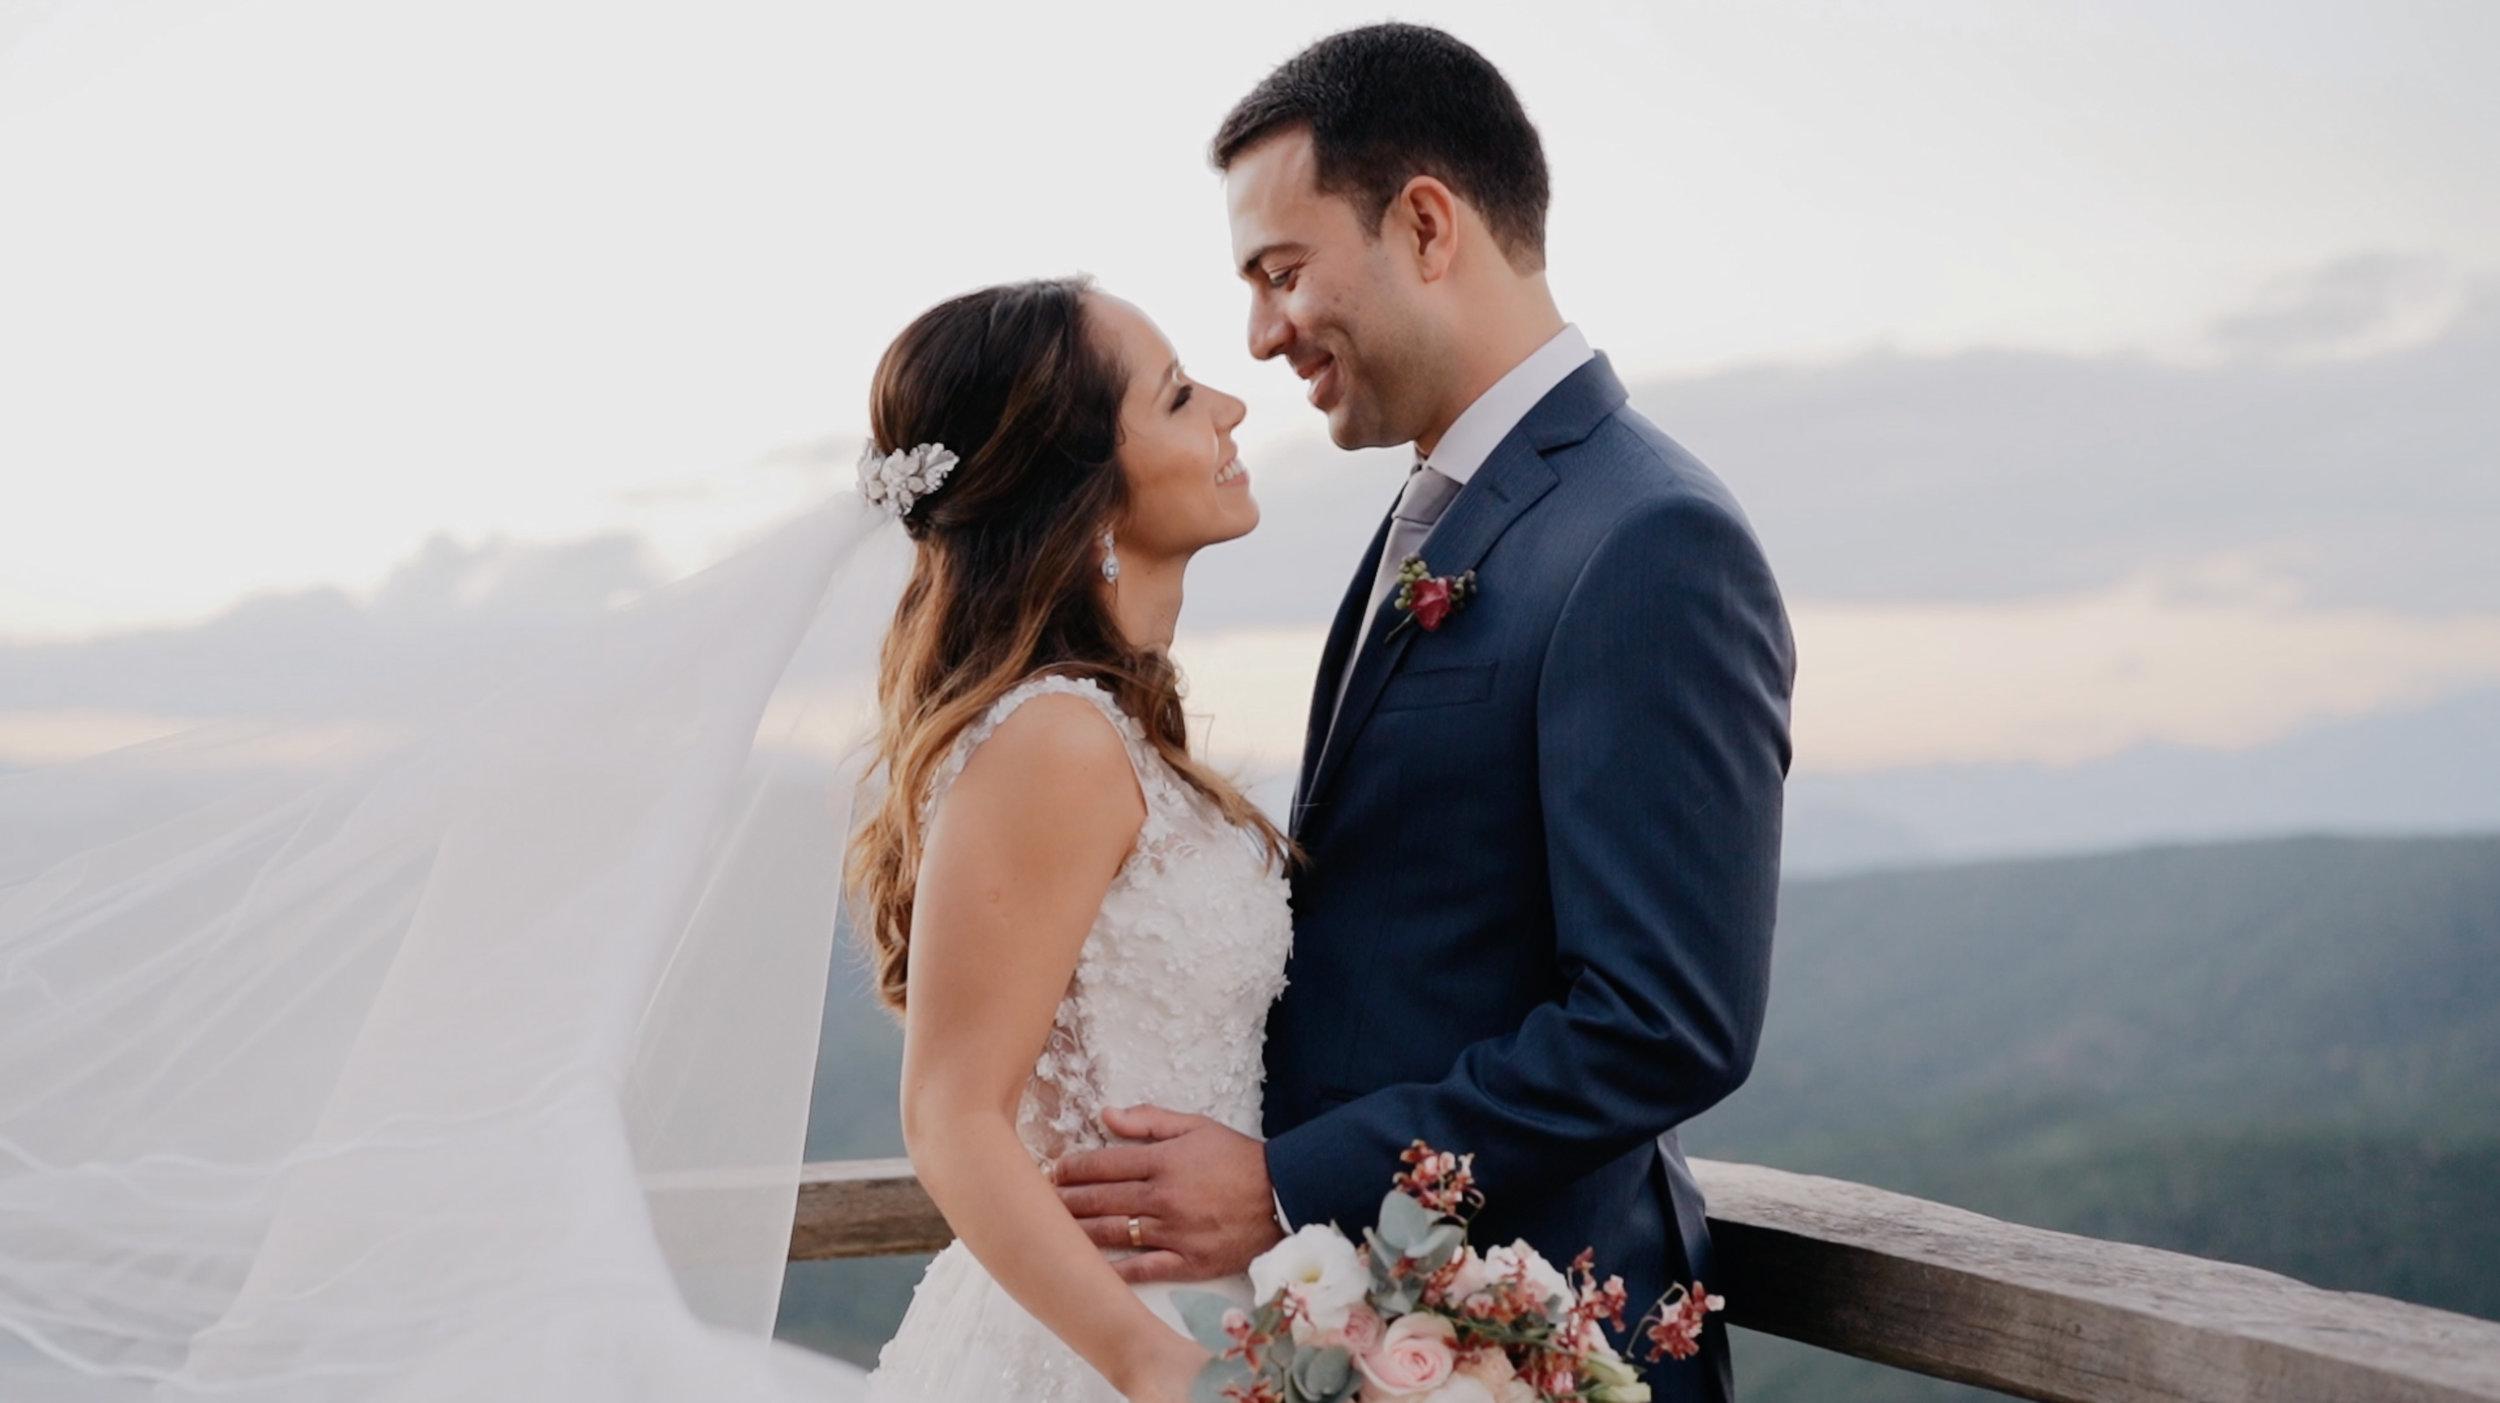 photographe-bruxelles-mariage-nicolasleleu8.jpg